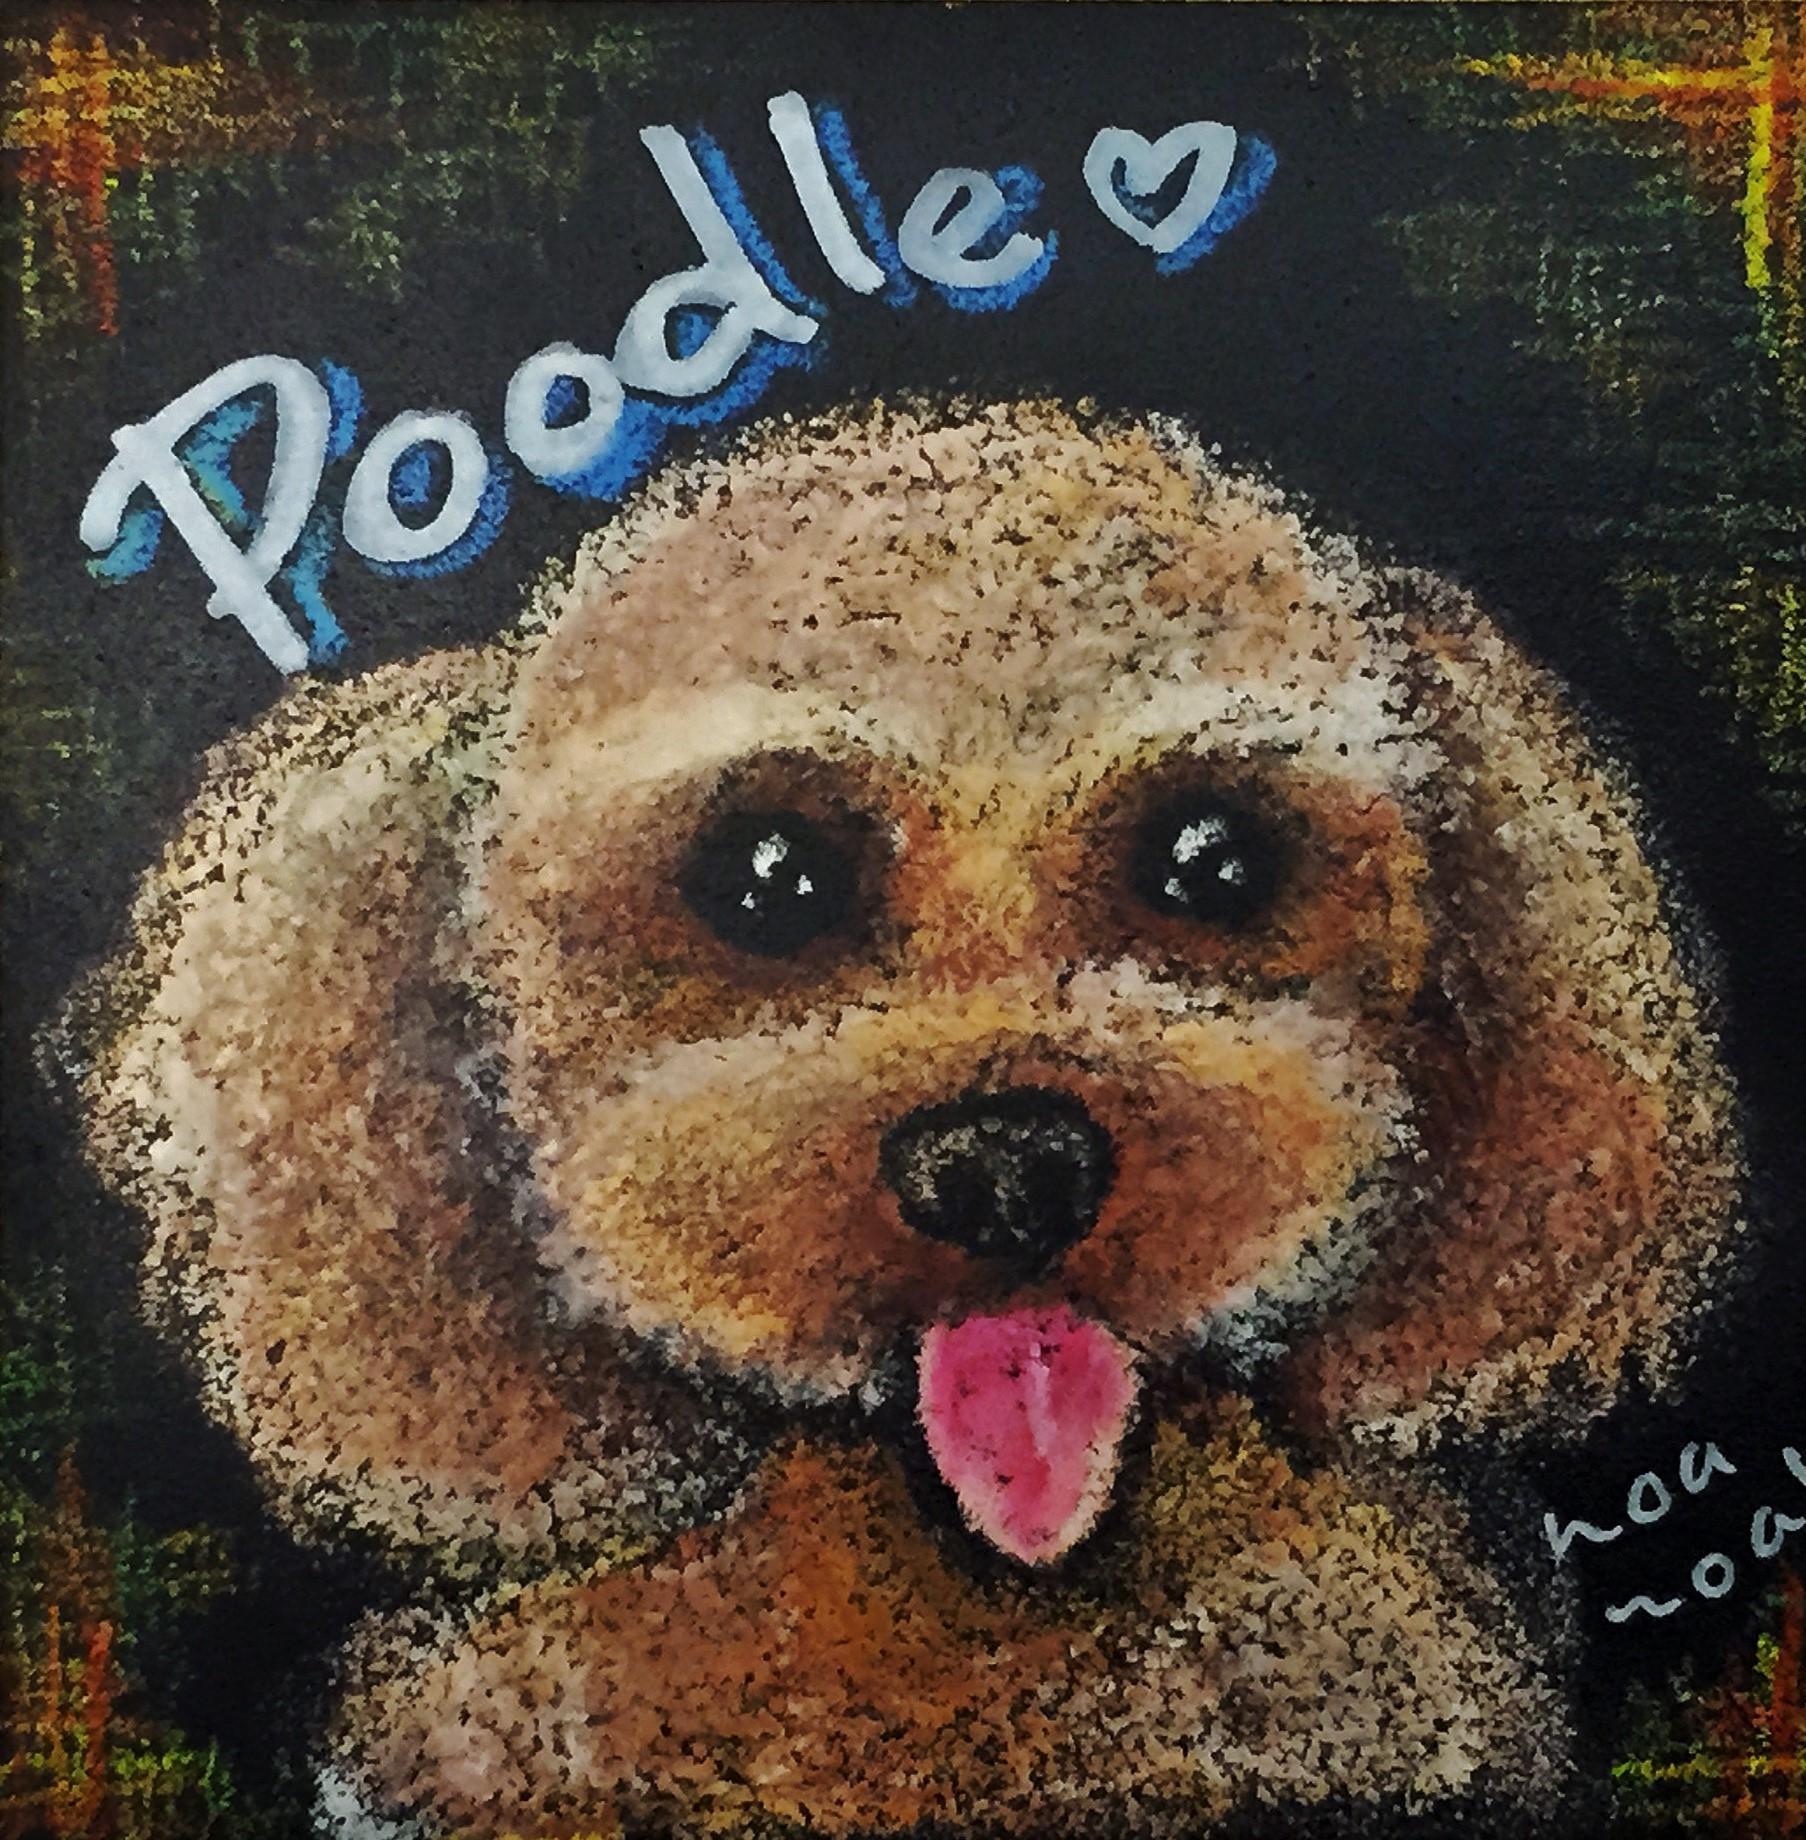 Poodle(ミニサイズ)